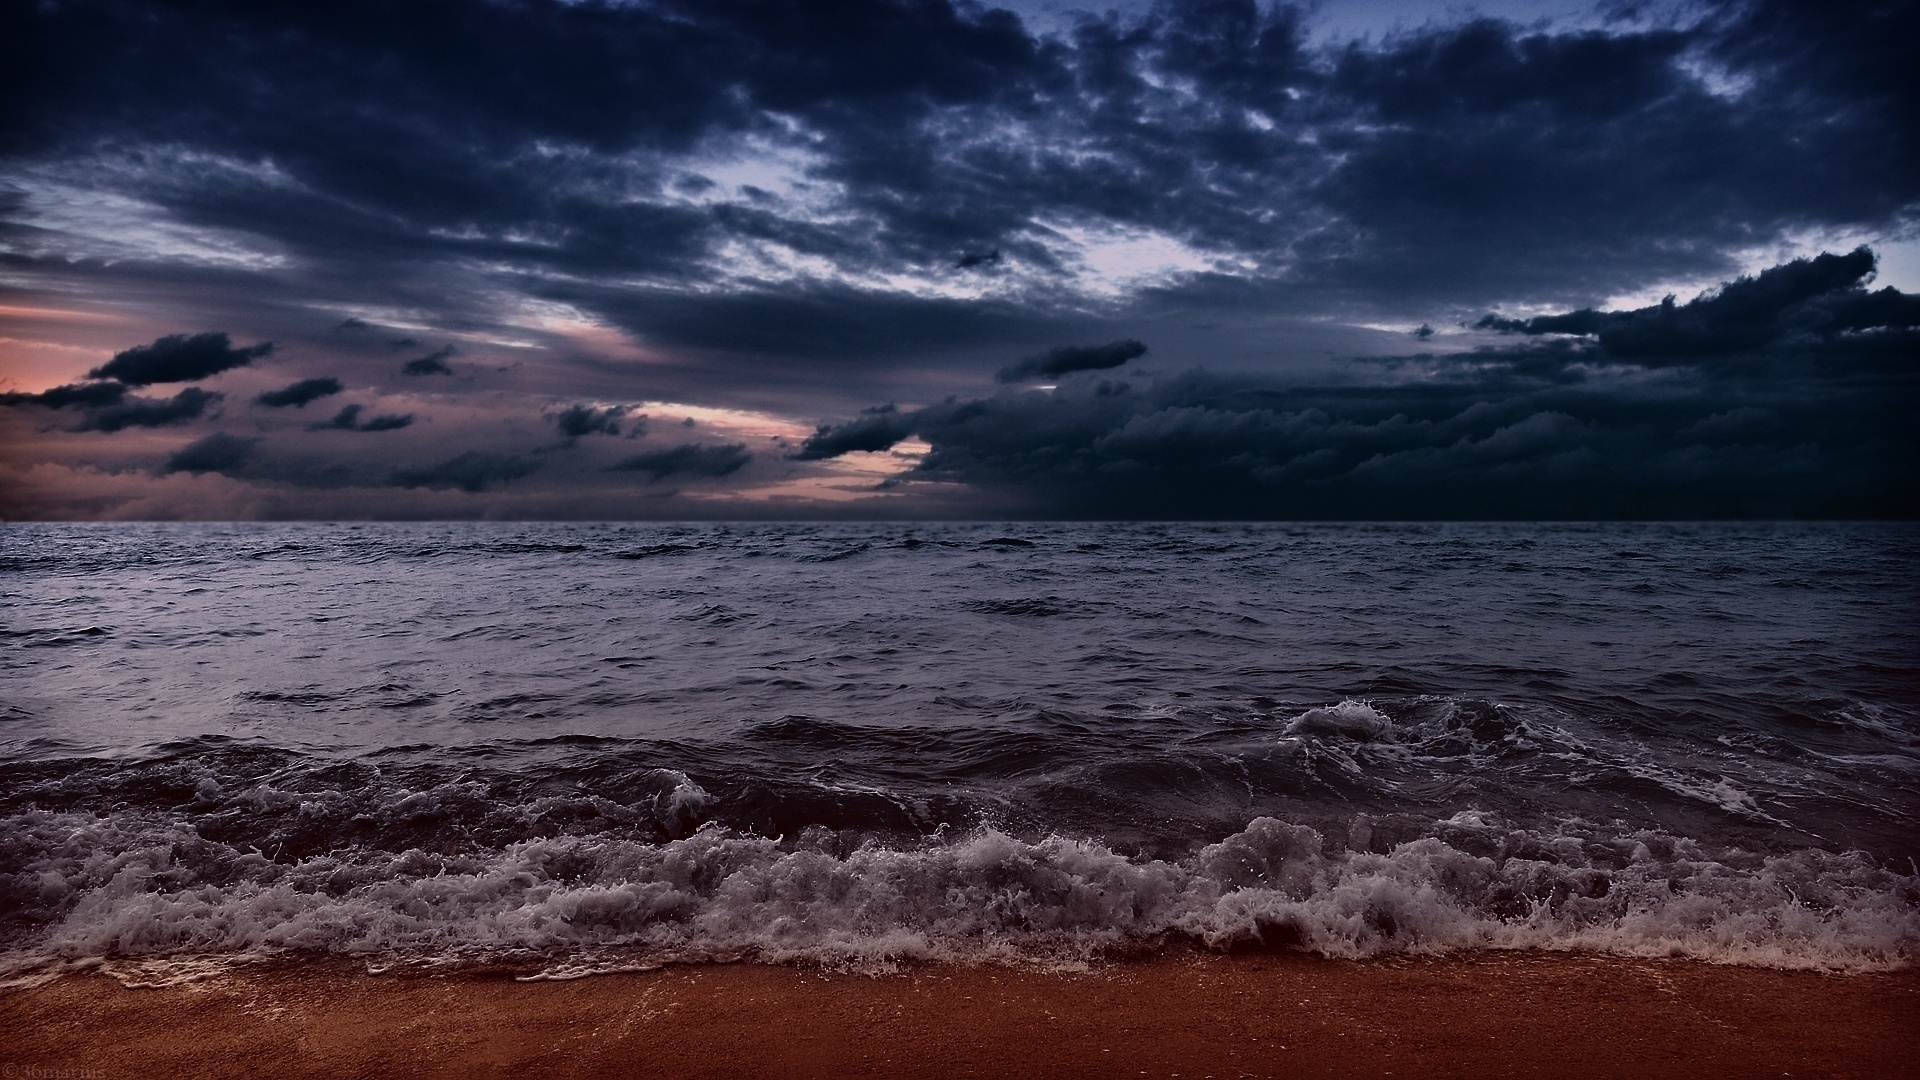 sea aeyaey waves beach sand clouds evening wallpaper | 1920x1080